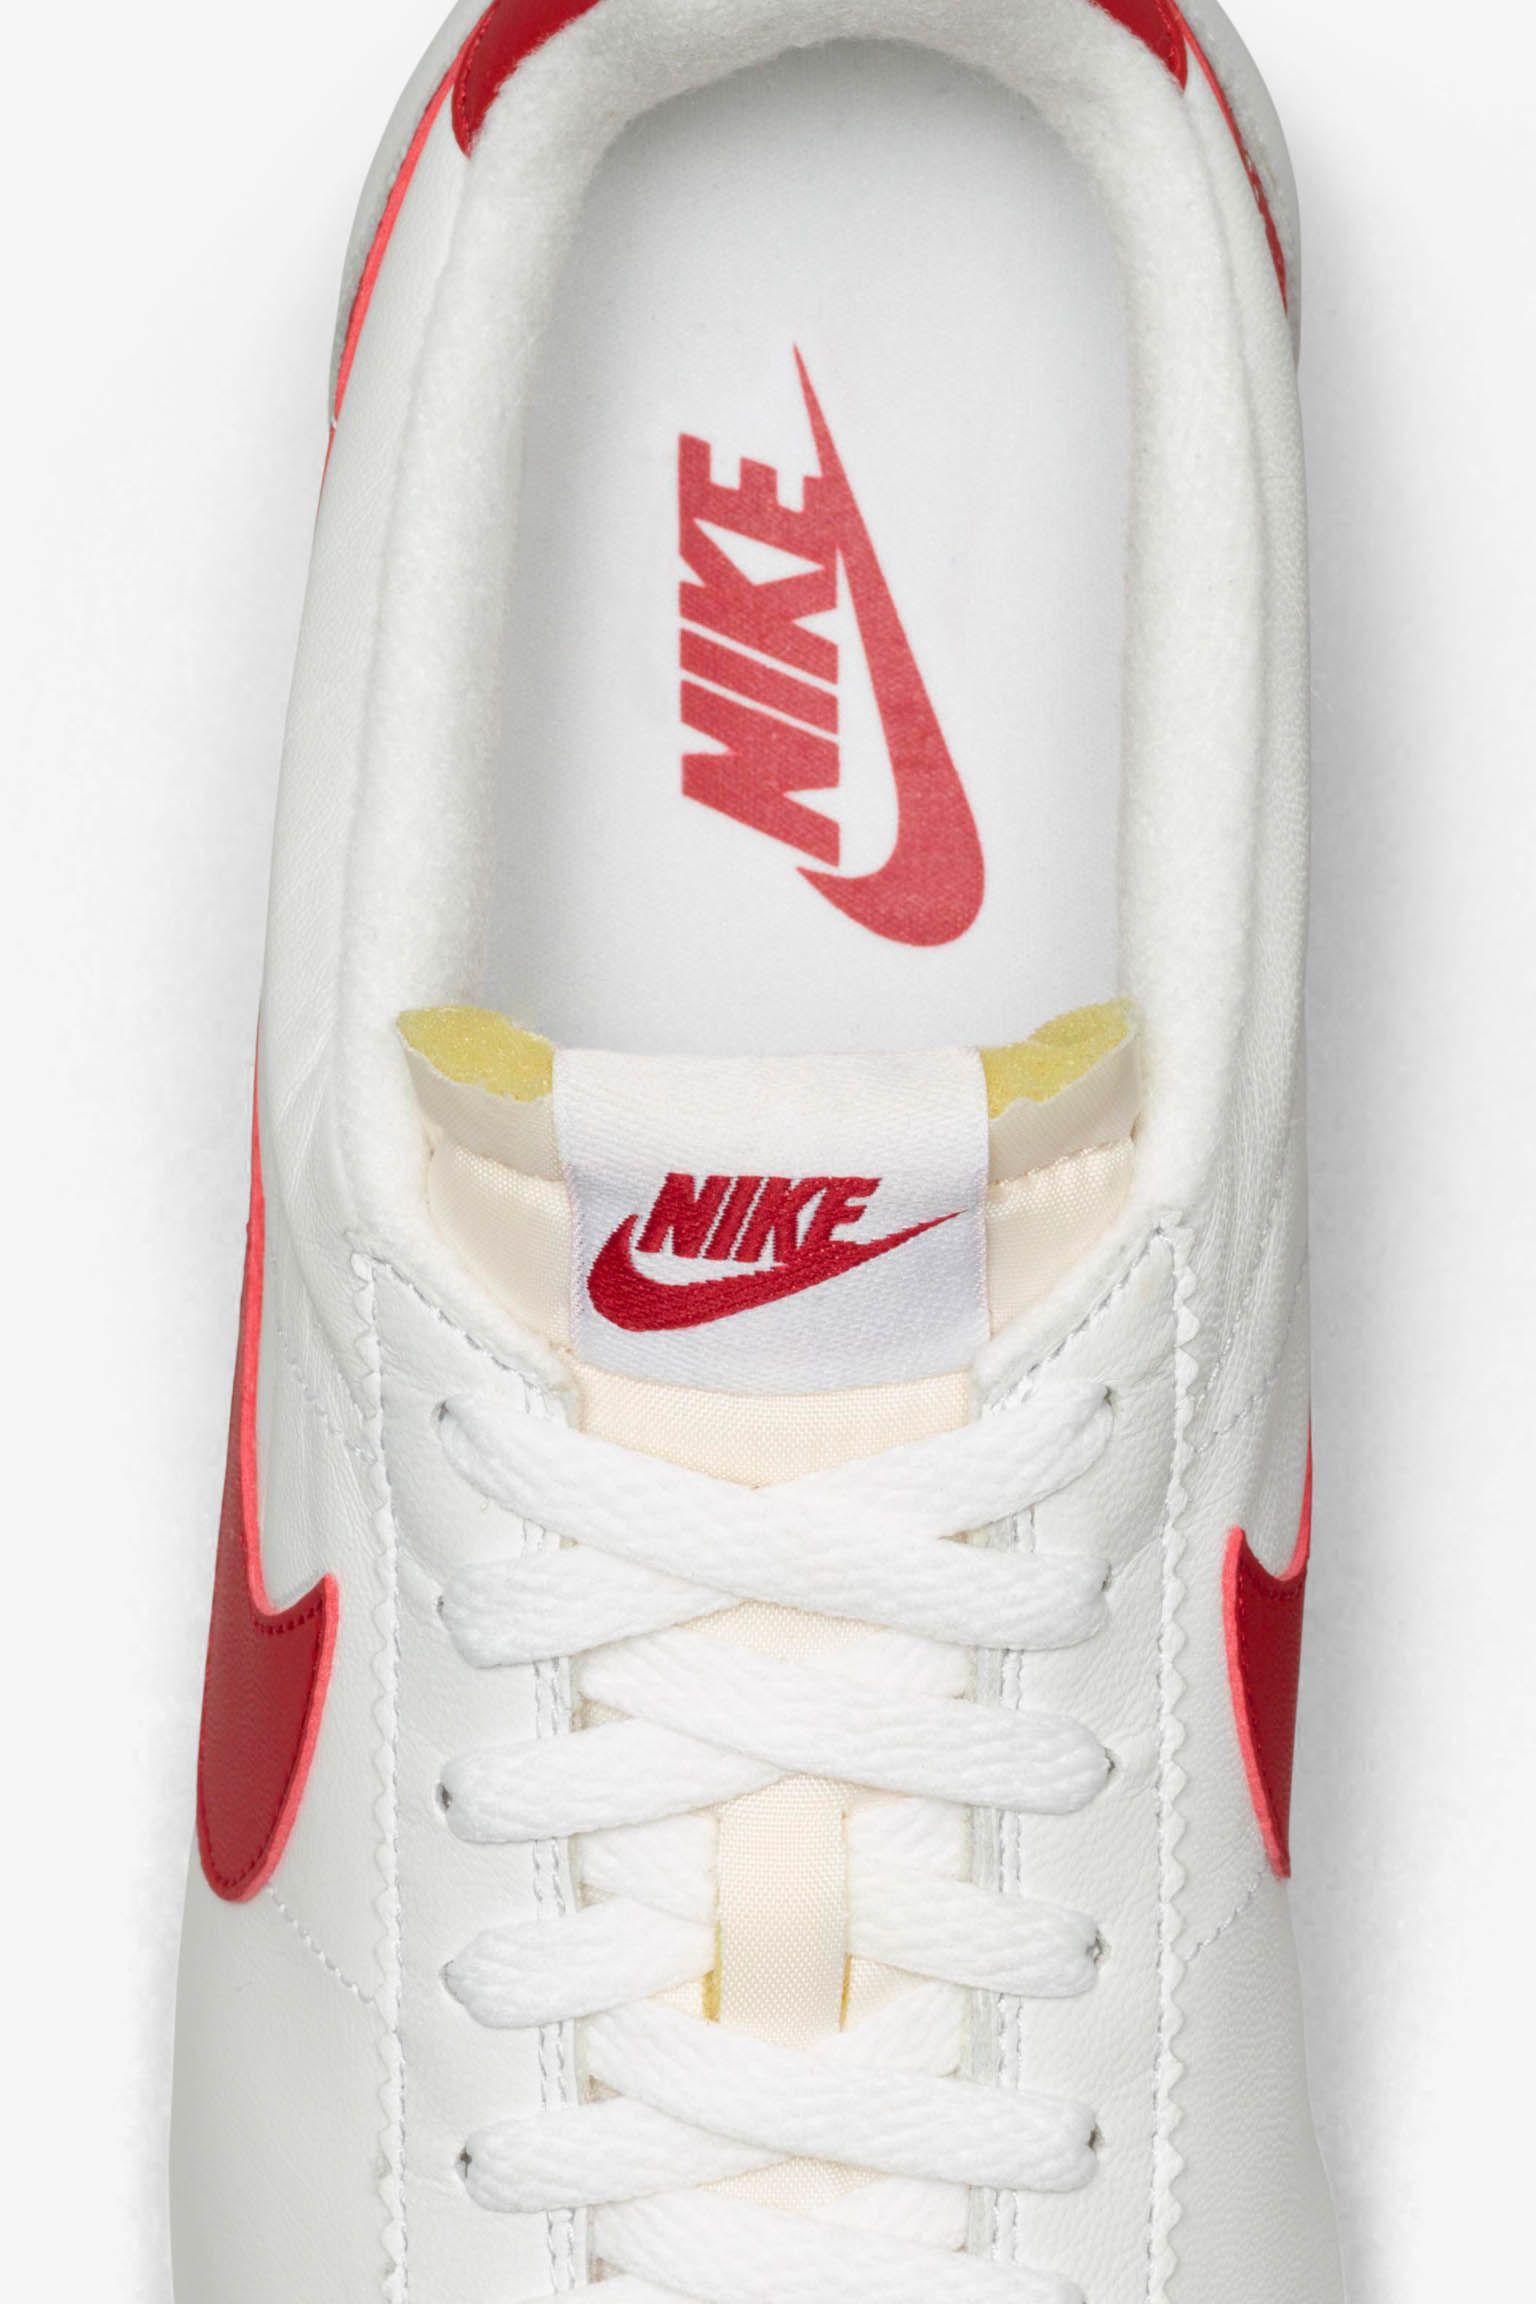 Nike Classic Cortez 'Always Ahead'